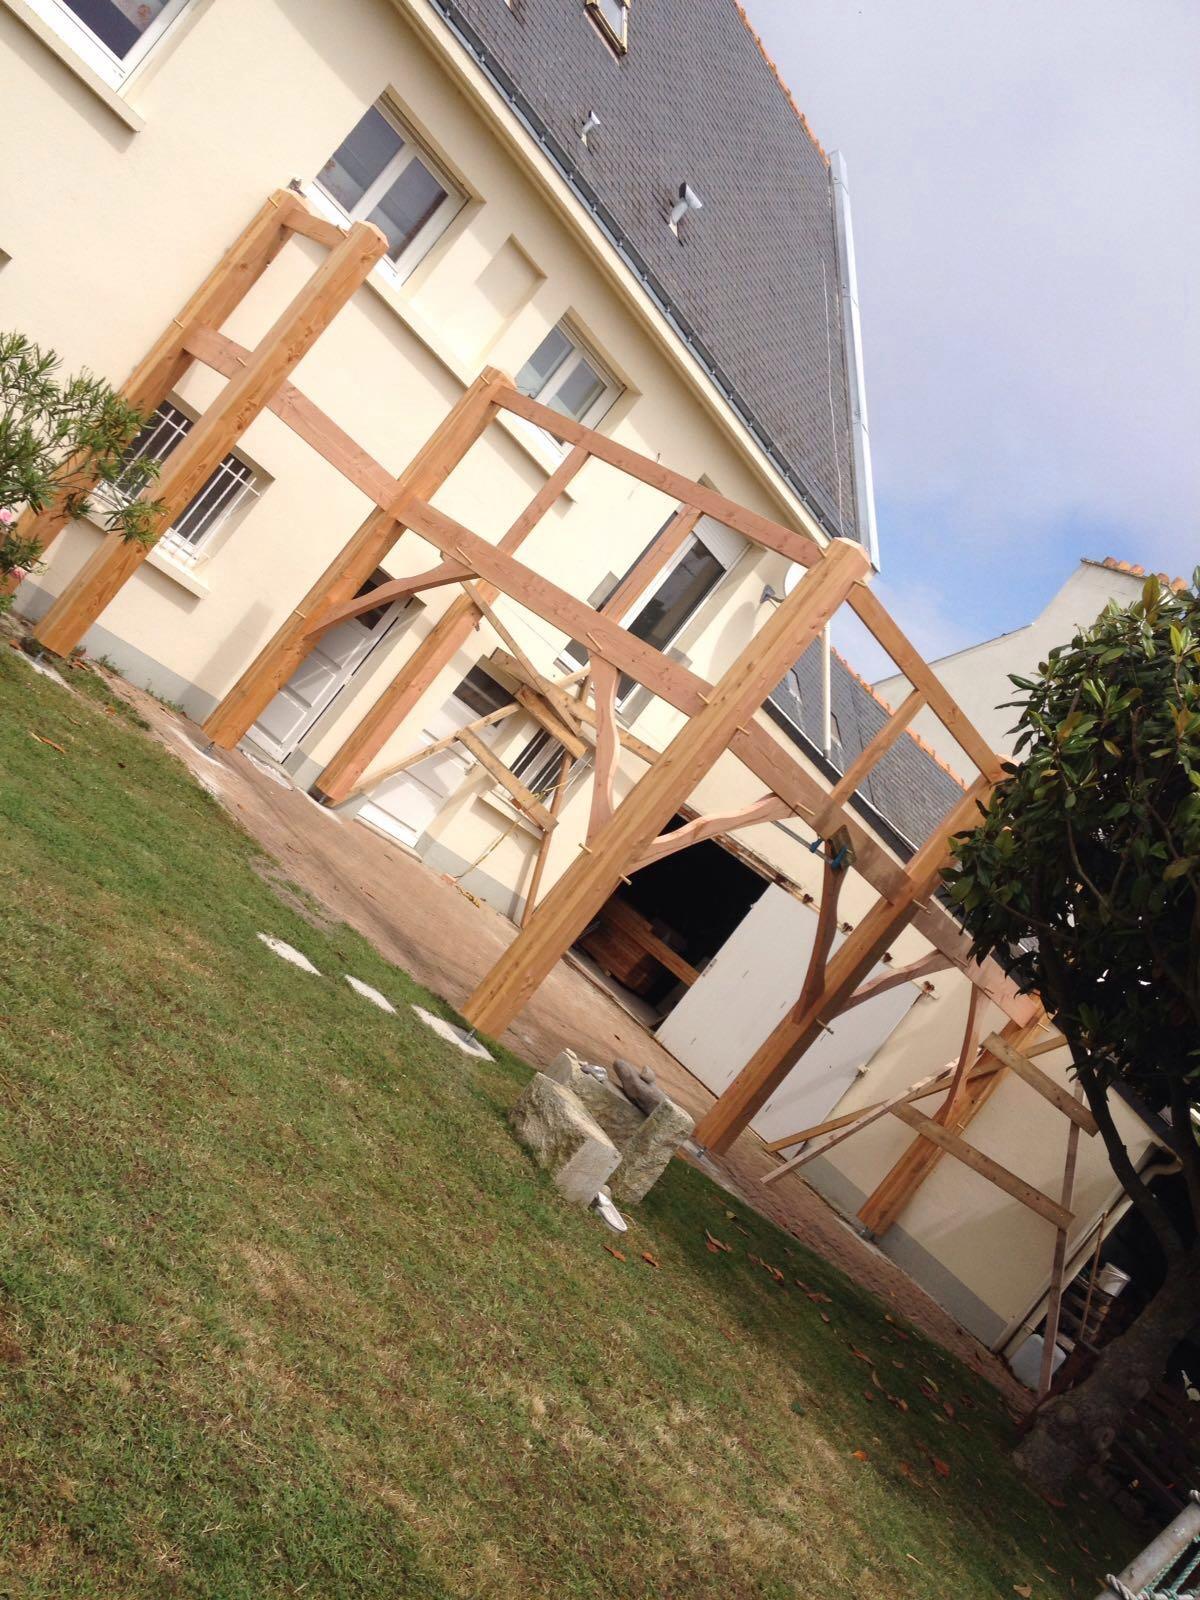 terrasses en bois cr ation sur mesure menuiserie msm herbignac. Black Bedroom Furniture Sets. Home Design Ideas